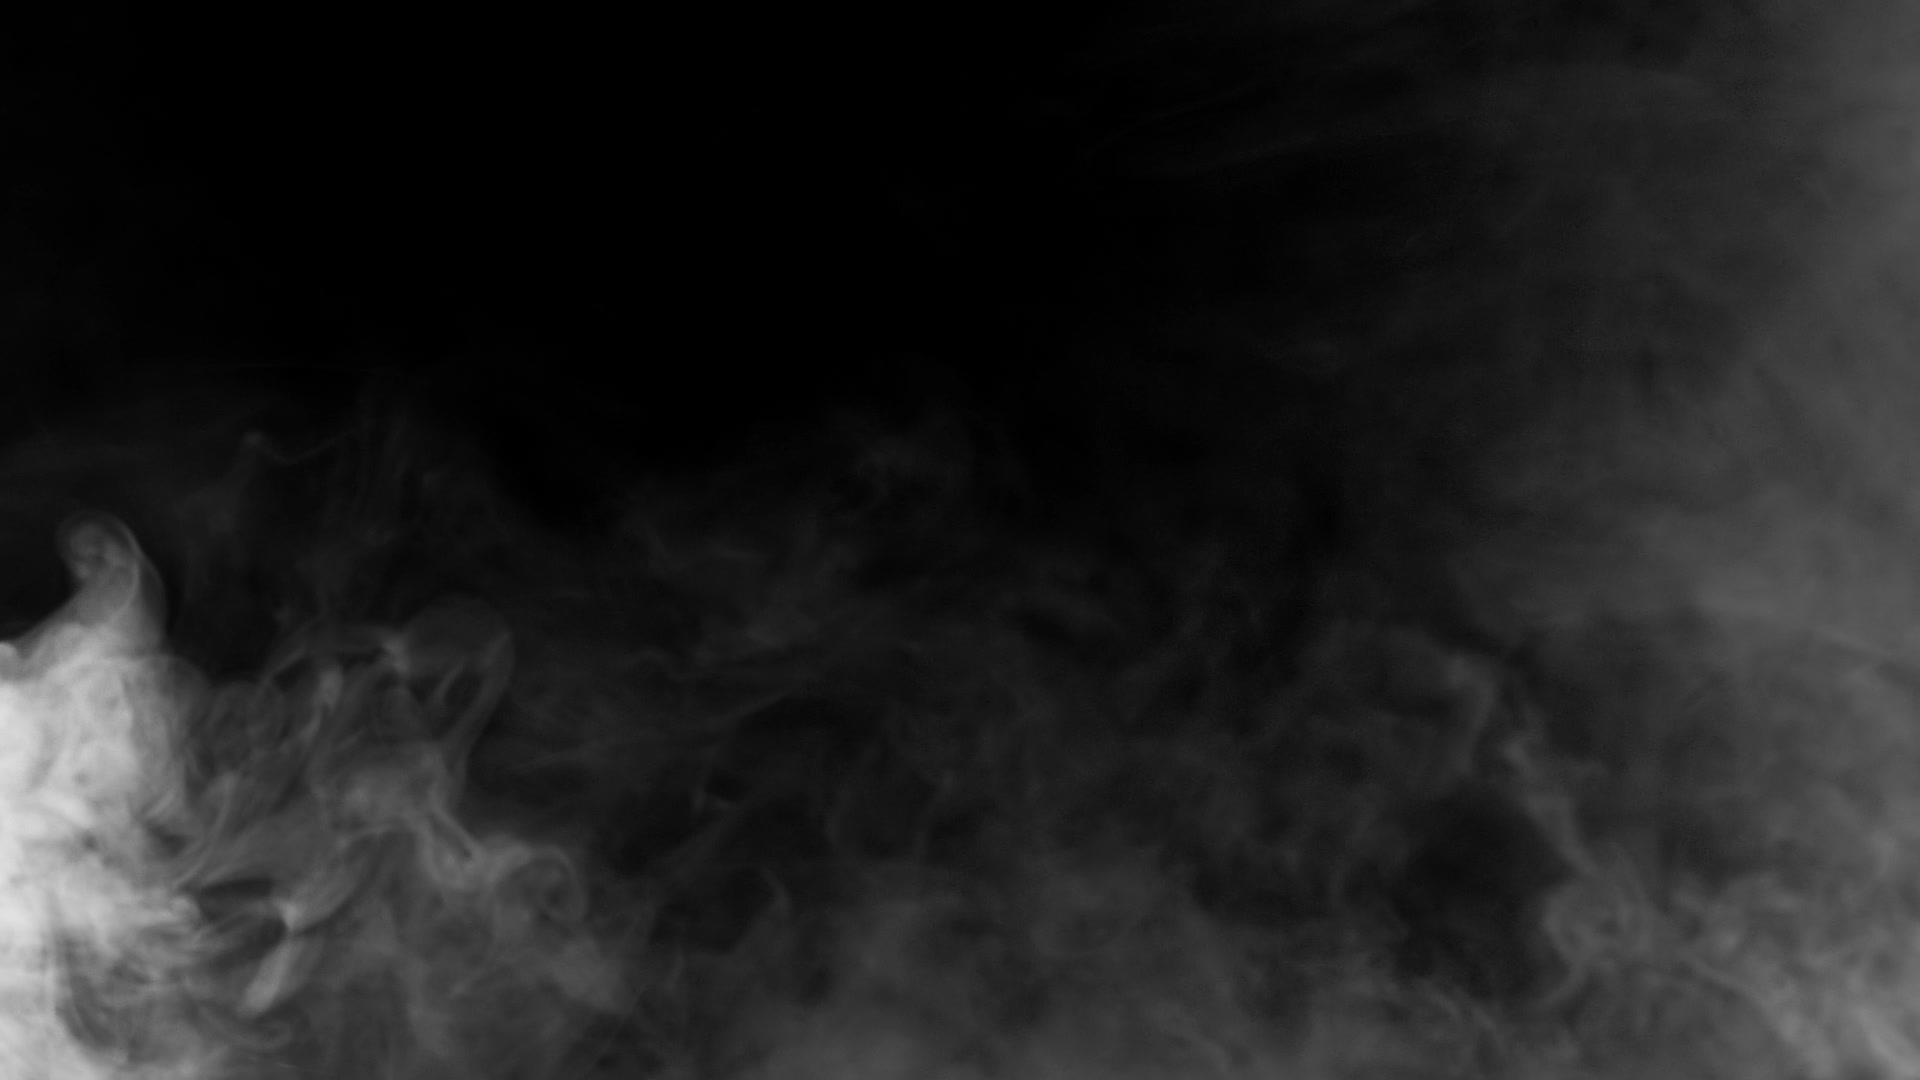 Smokey Wallpaper Posted By Ryan Simpson